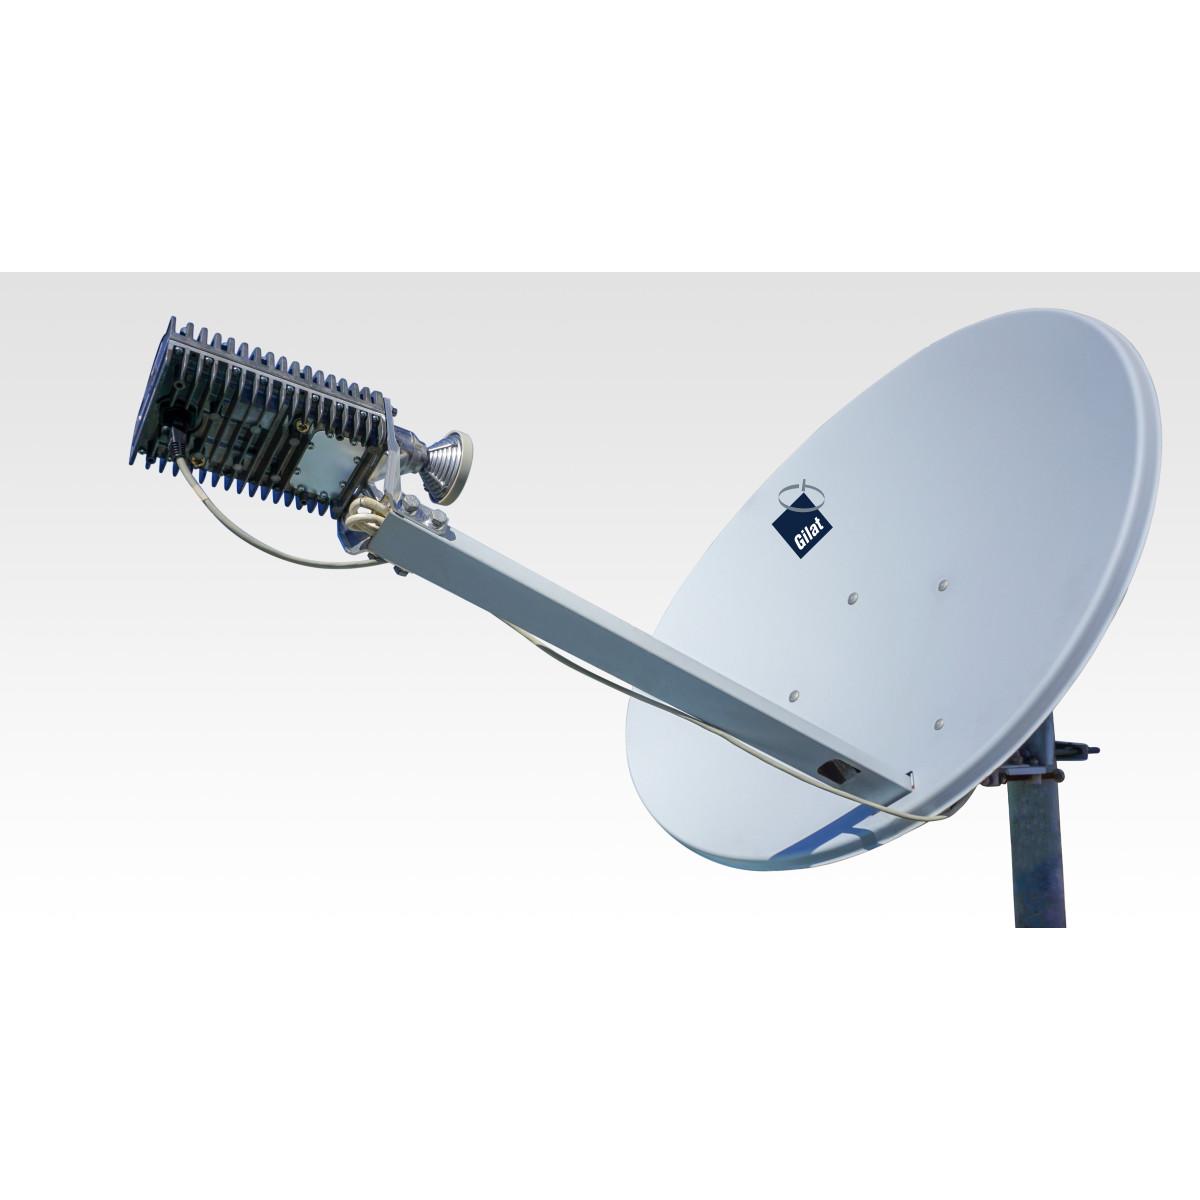 Комплект спутникового терминала Scorpio-i АЗСС SkyEdgeII-c-076/Ka